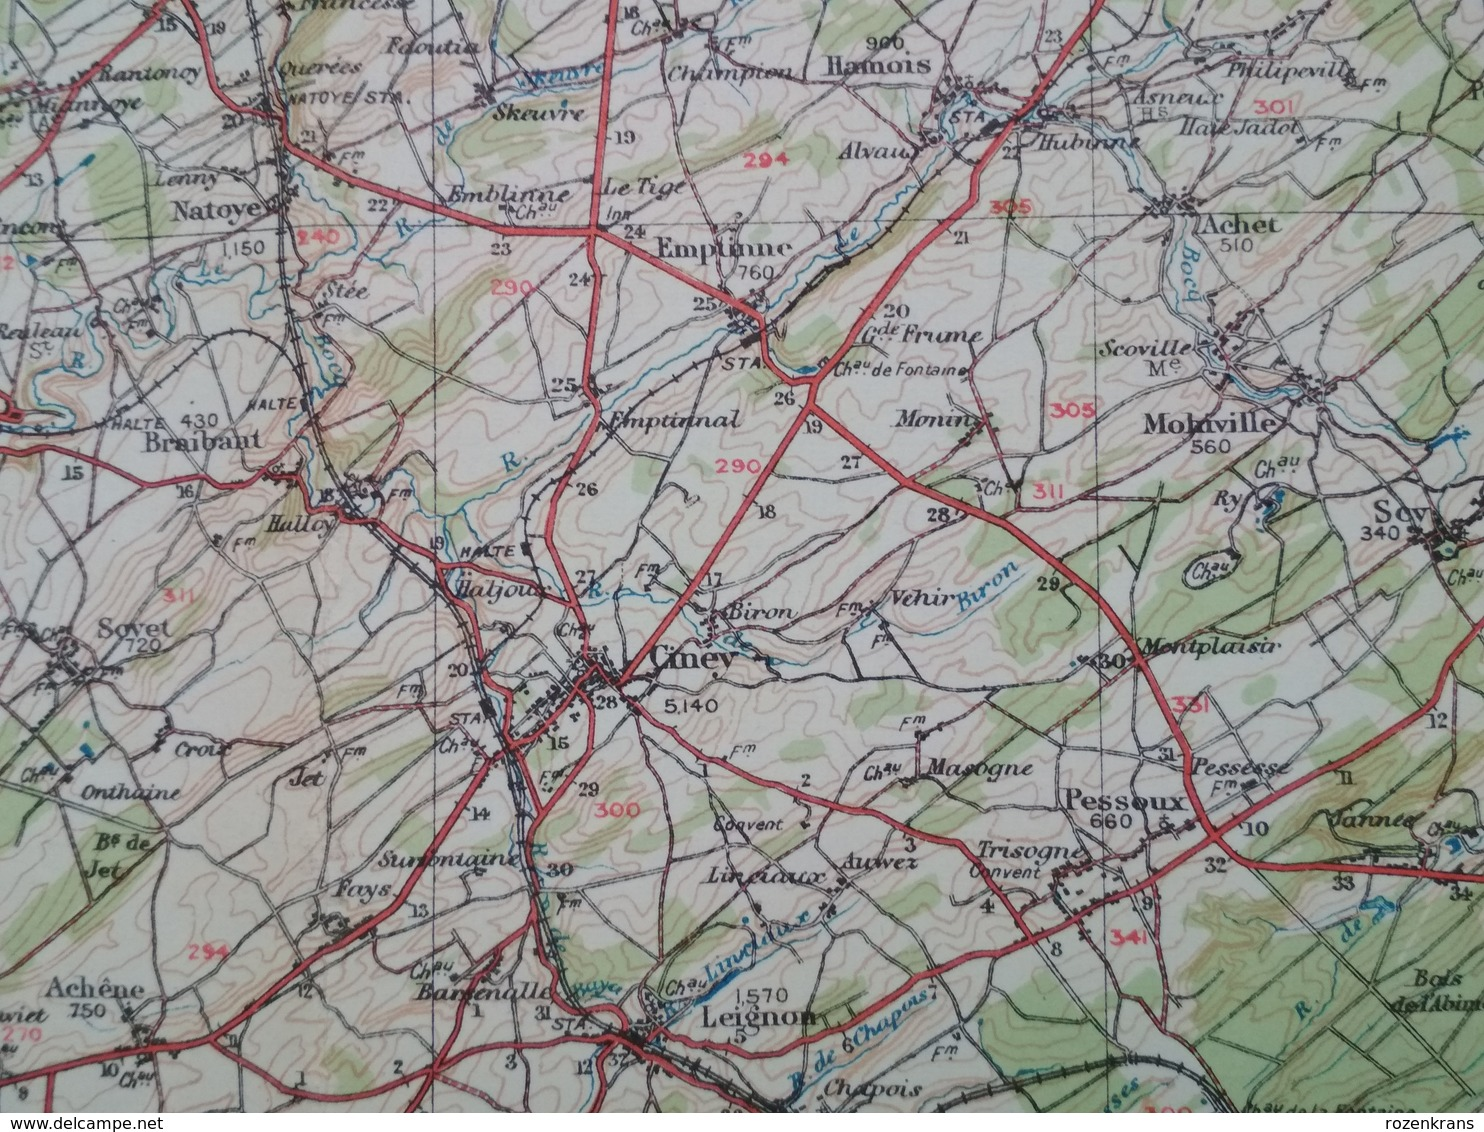 Carte Topographique Militaire UK War Office 1916 World War 1 WW1 Marche Durbuy La Roche Houffalize Aywaille Han Barvaux - Cartes Topographiques